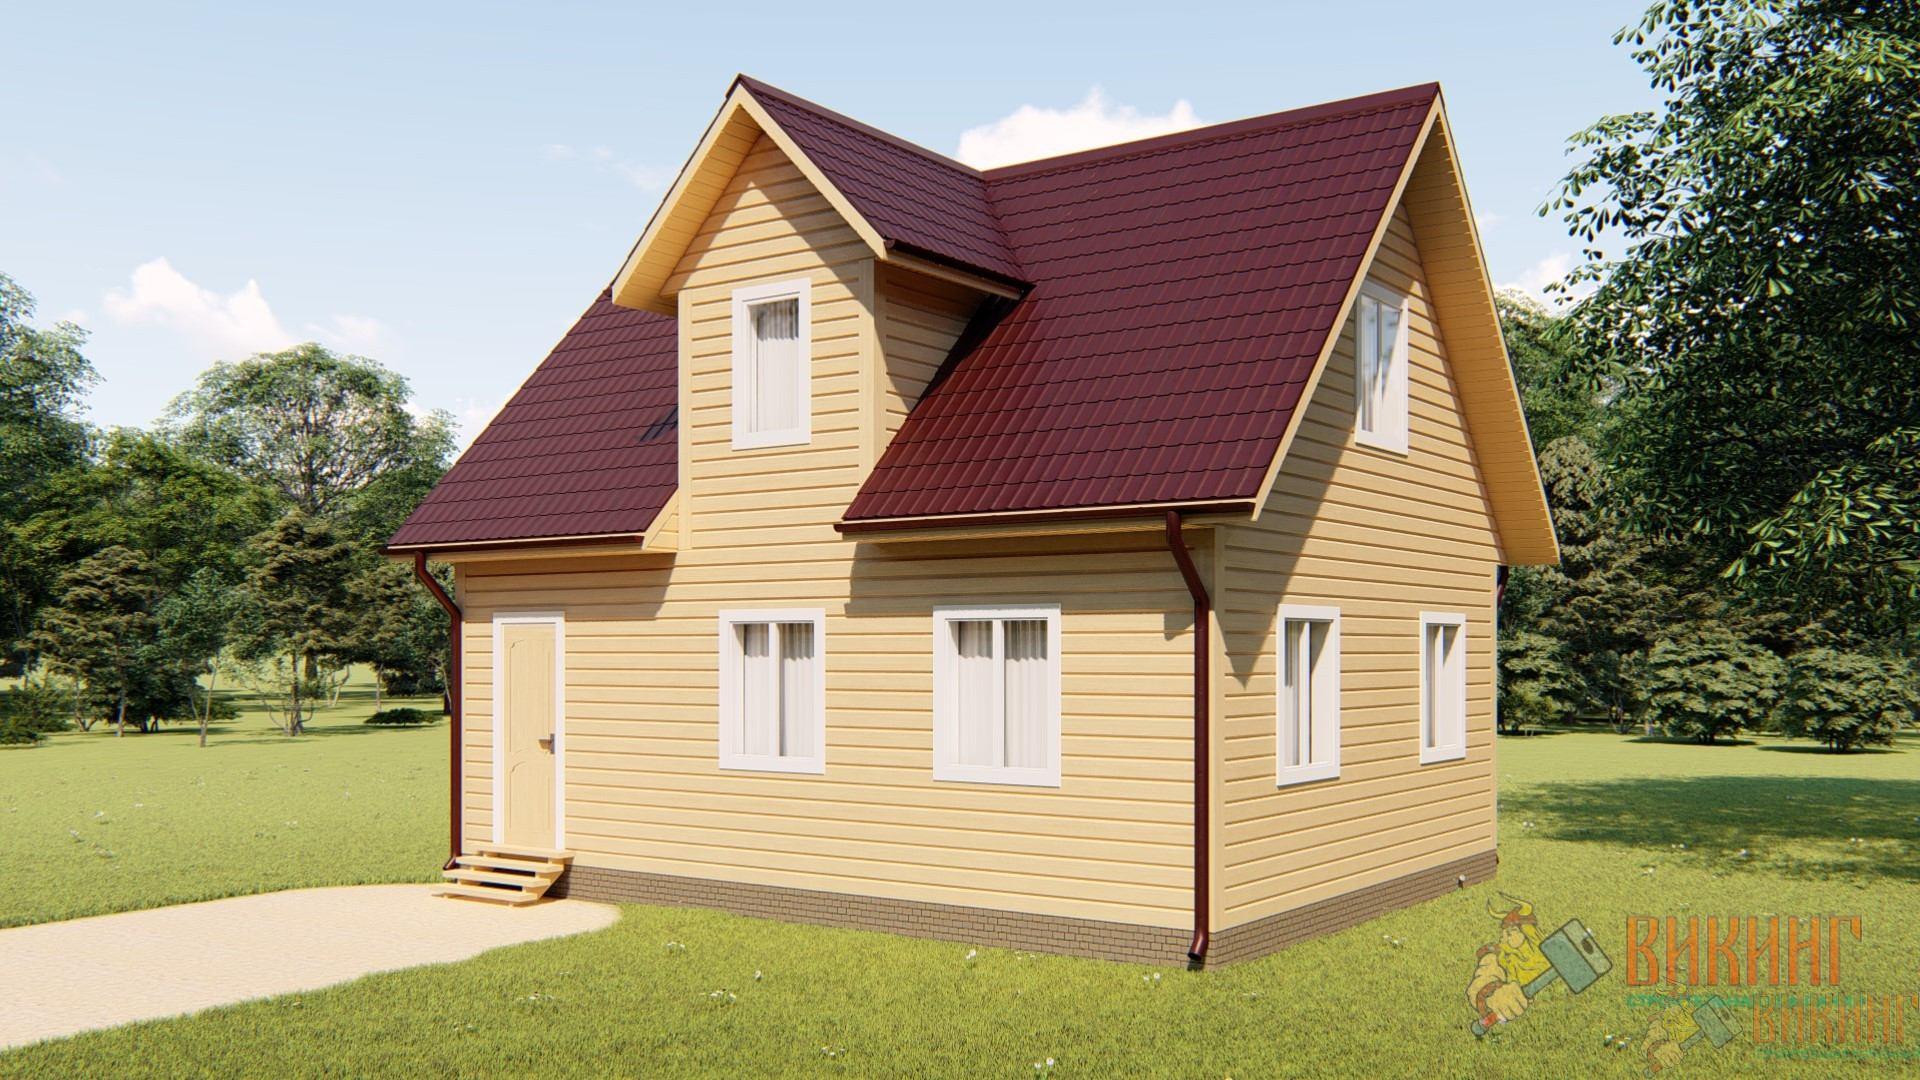 Каркасный дом 6х8 с мансардным этажом